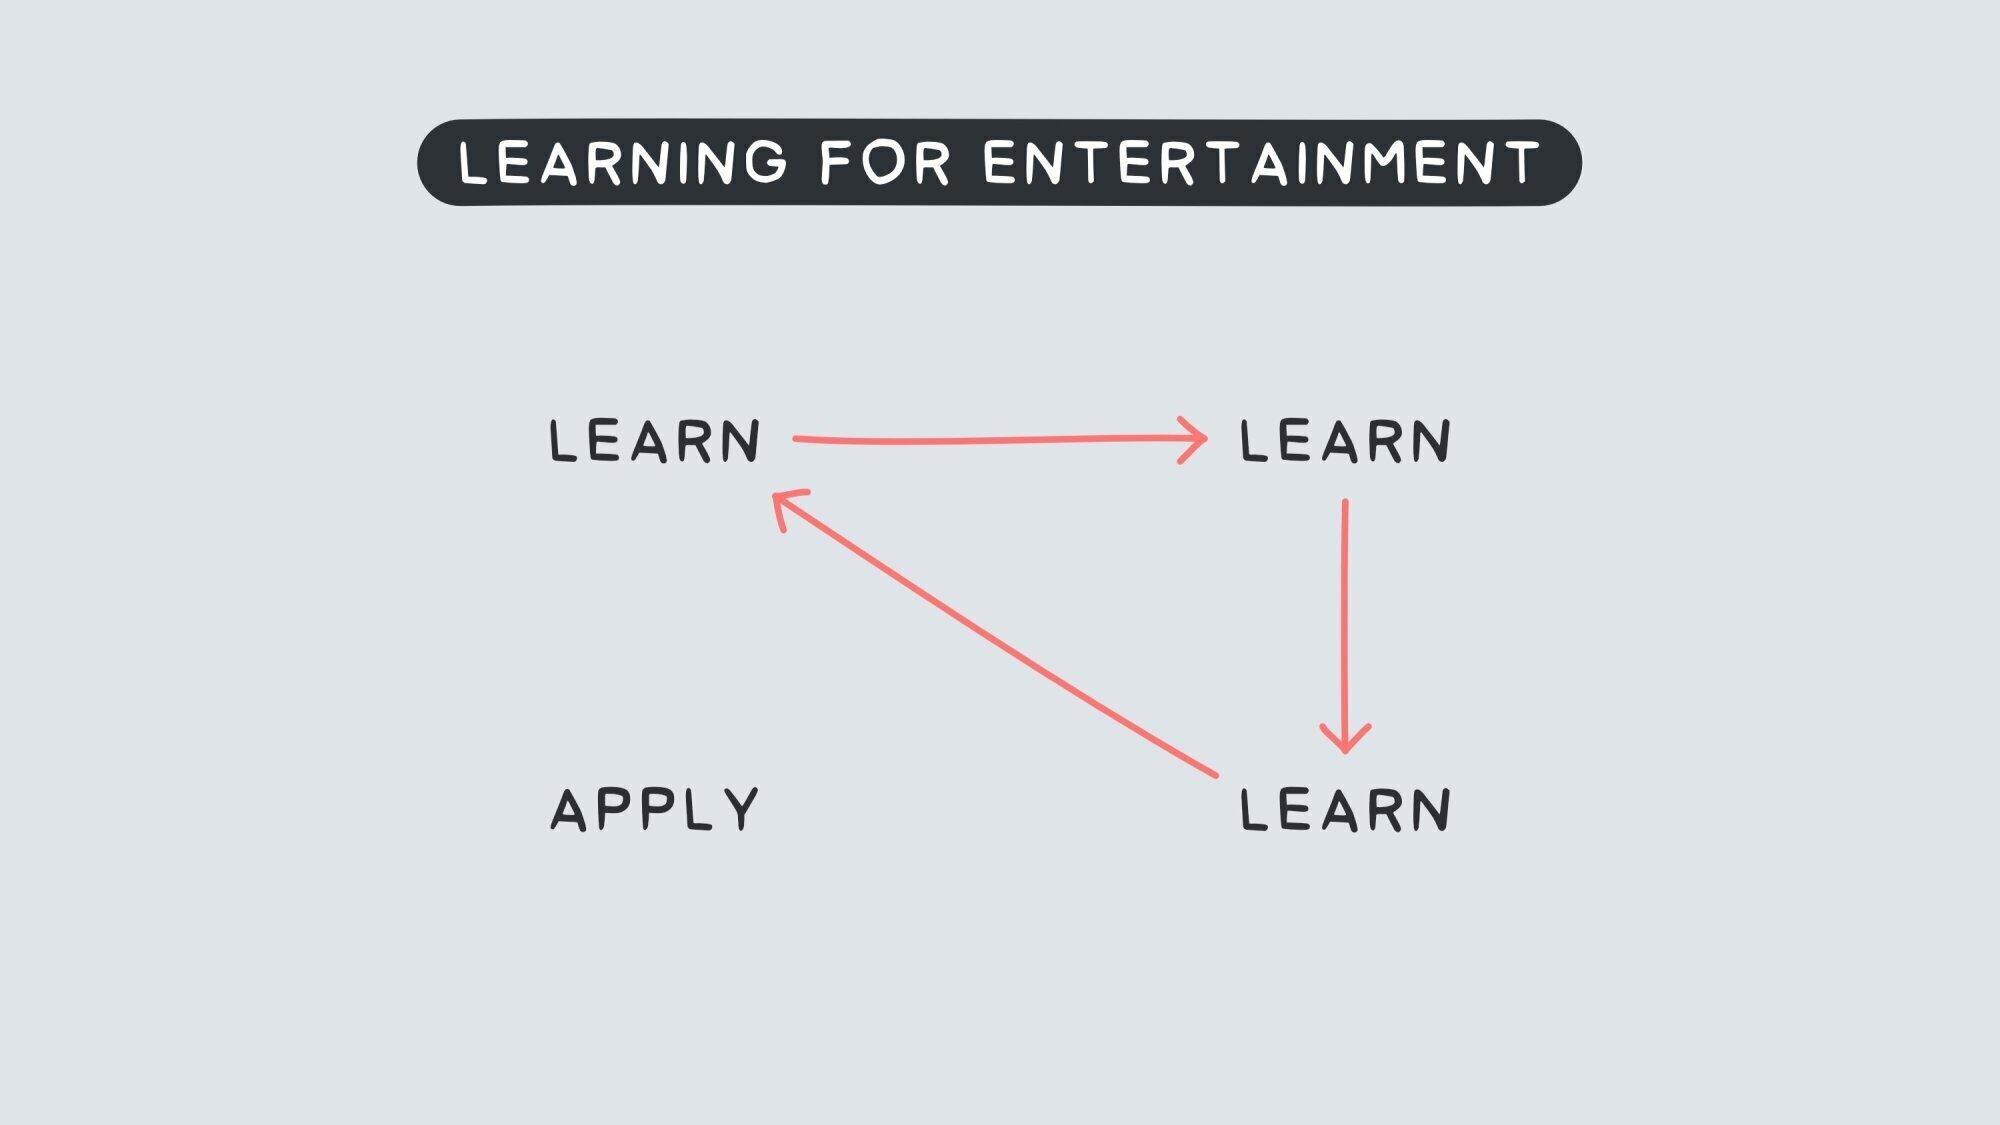 9f7fccaa-9a20-11ea-a3d0-06b4694bee2a%2F1627505237599-learning+for+entertainment+.jpg